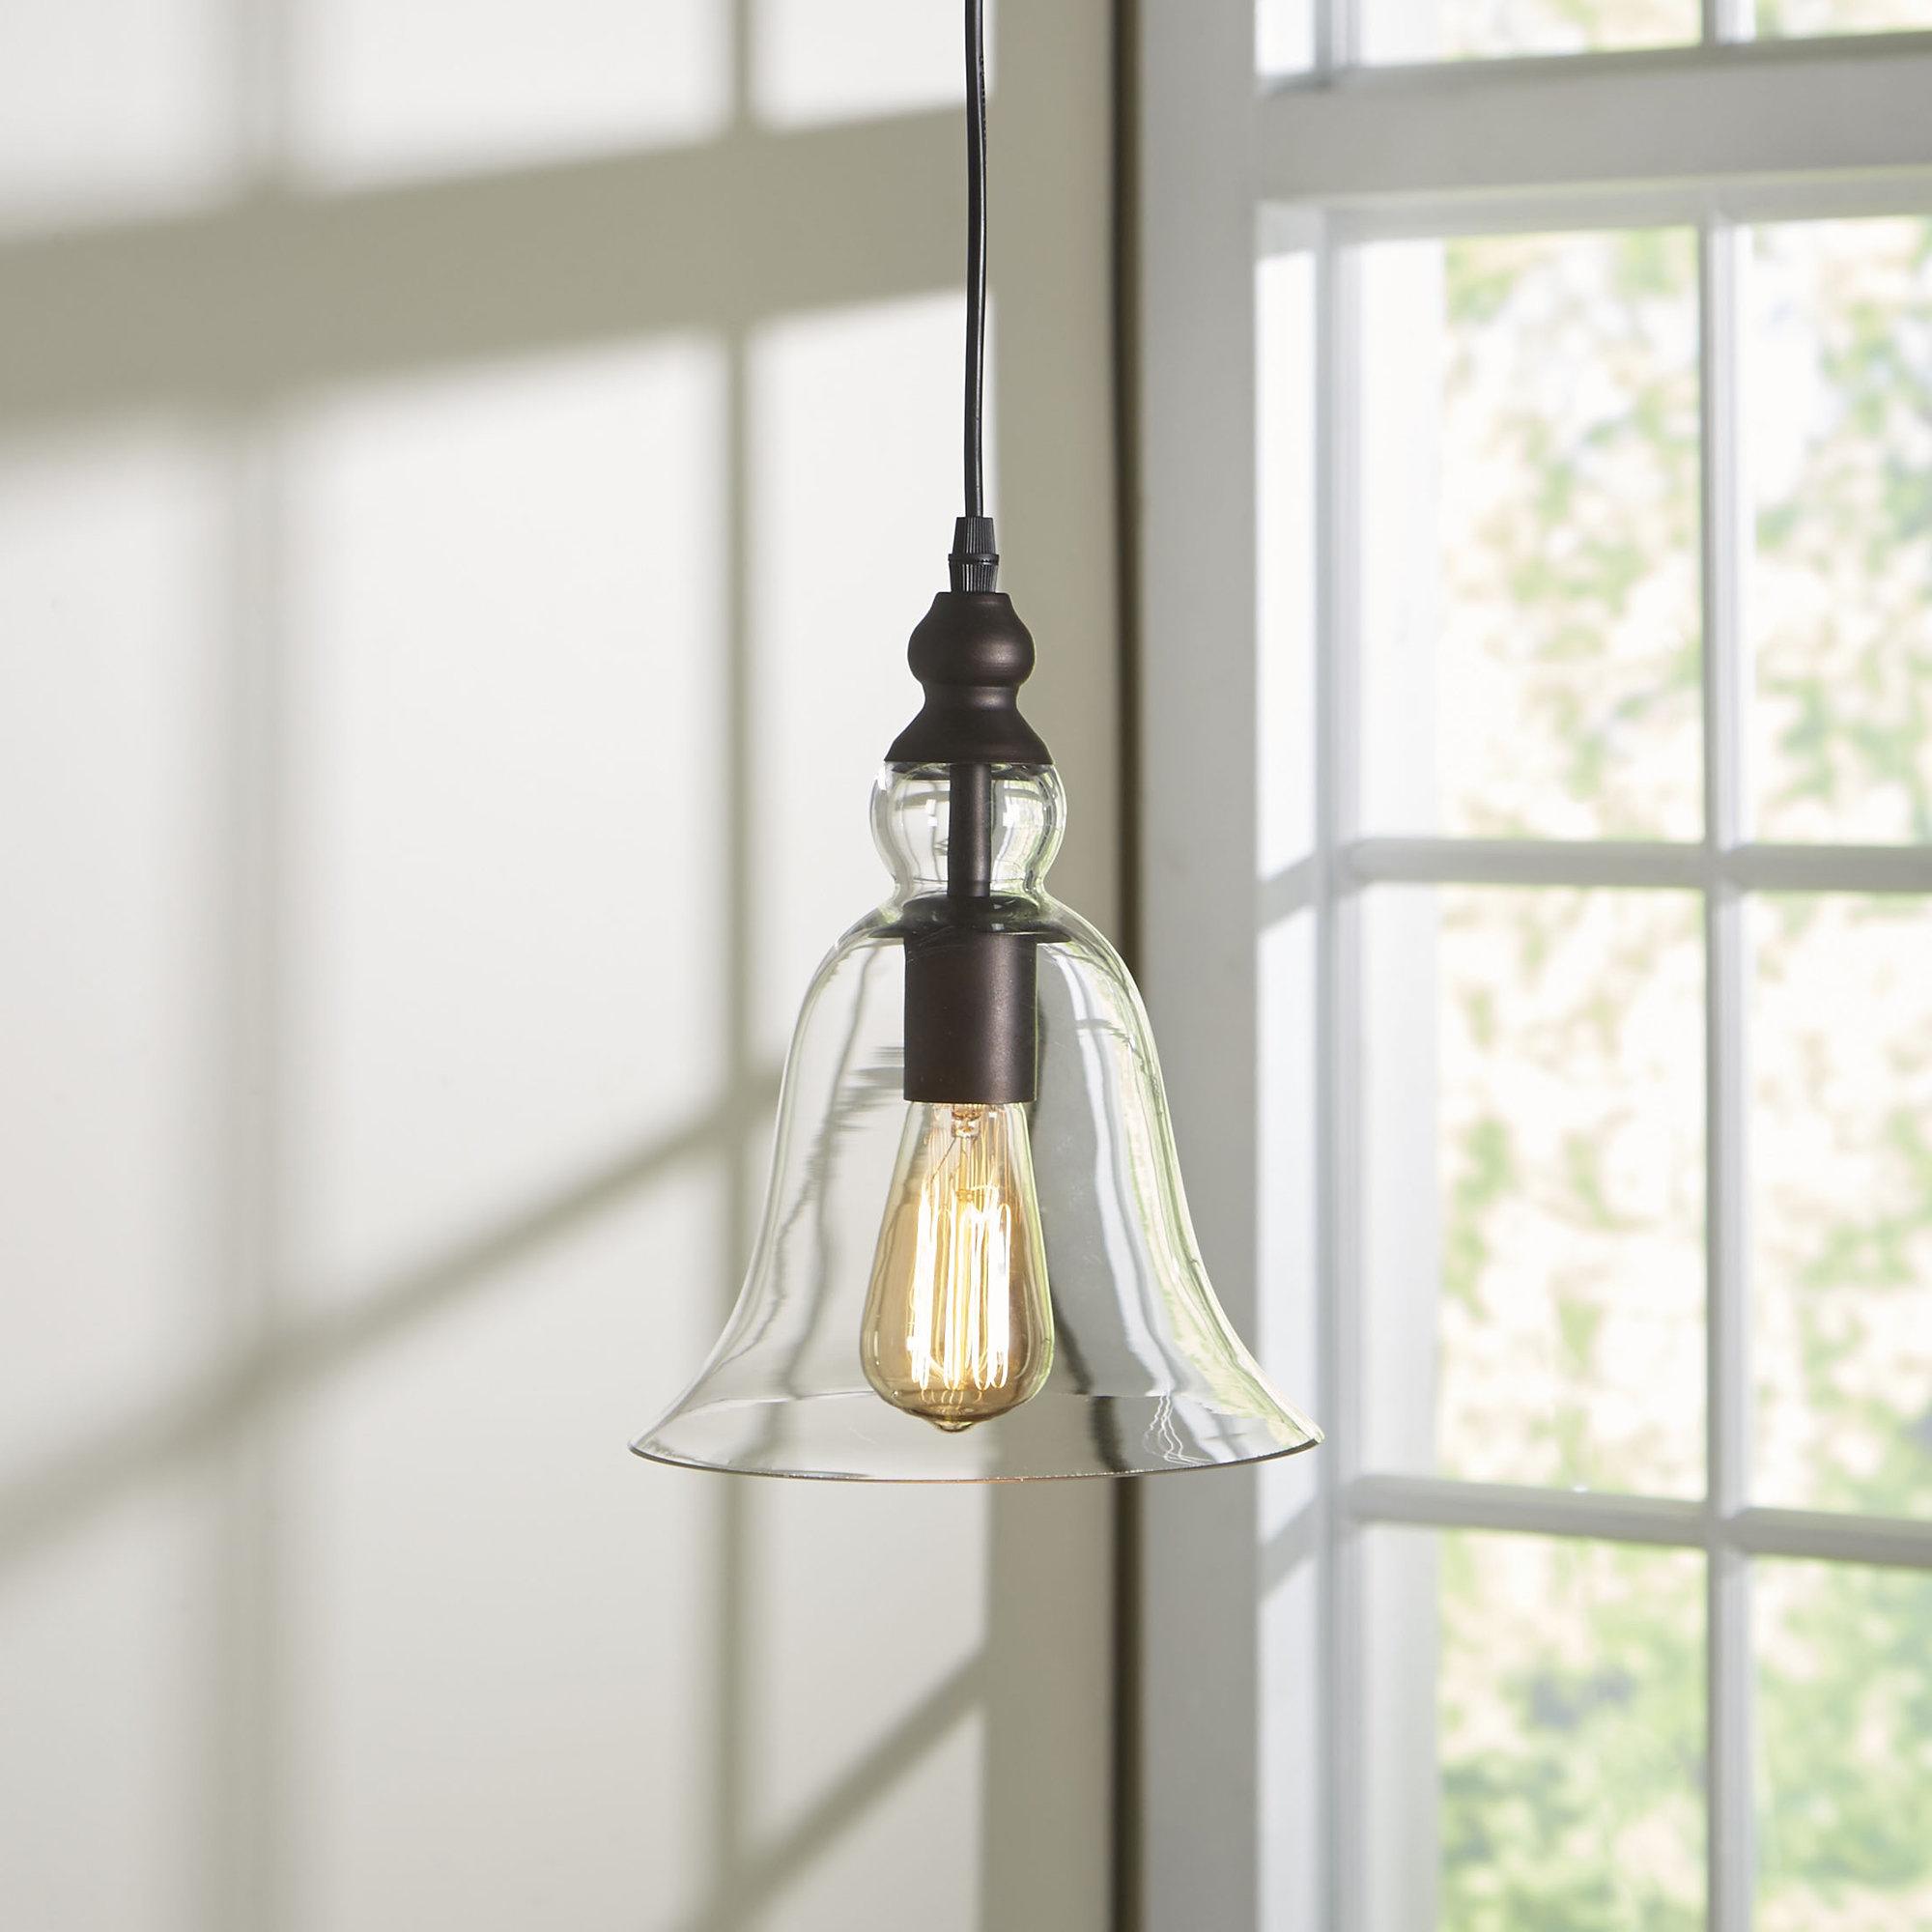 2019 Bouvet 1 Light Bell Pendant Regarding Carey 1 Light Single Bell Pendants (View 1 of 25)